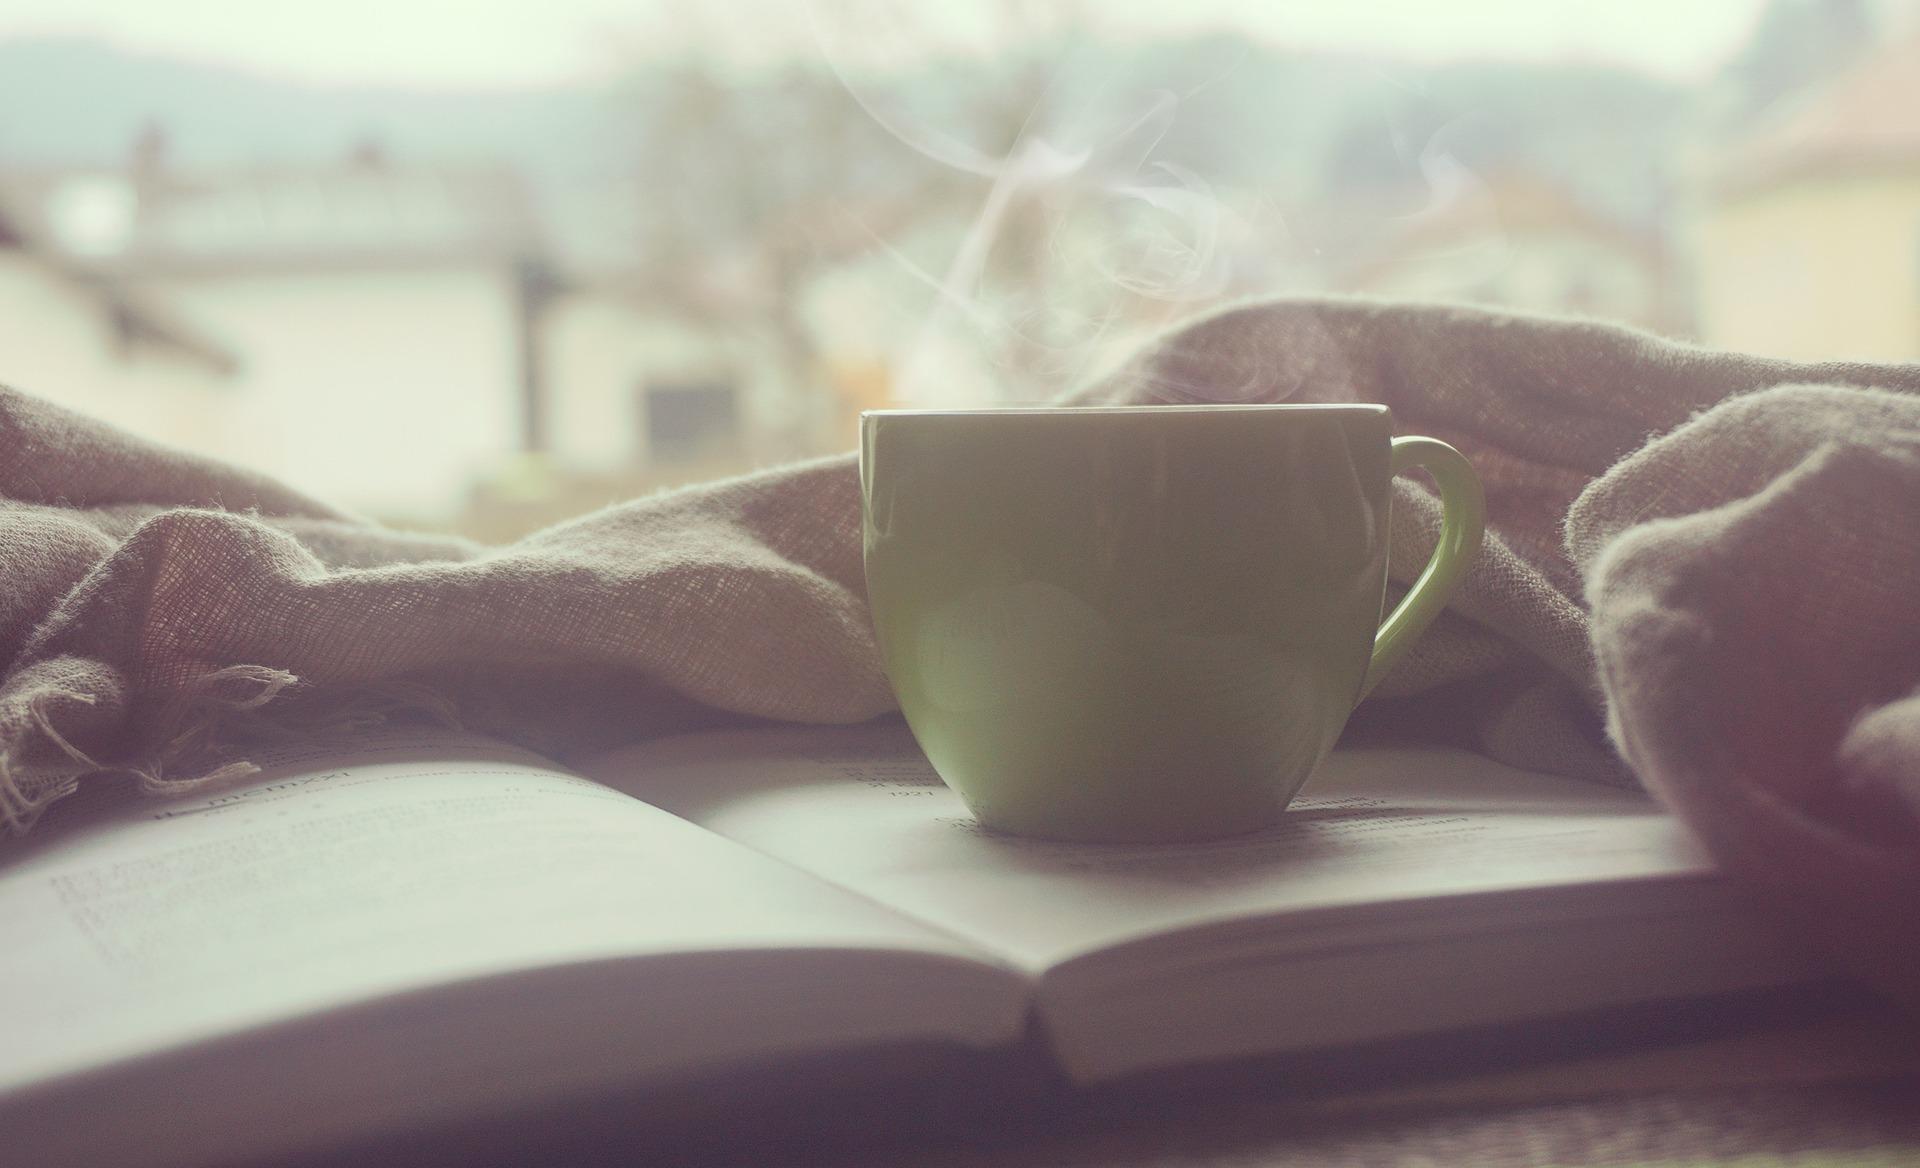 Mug with warm drink